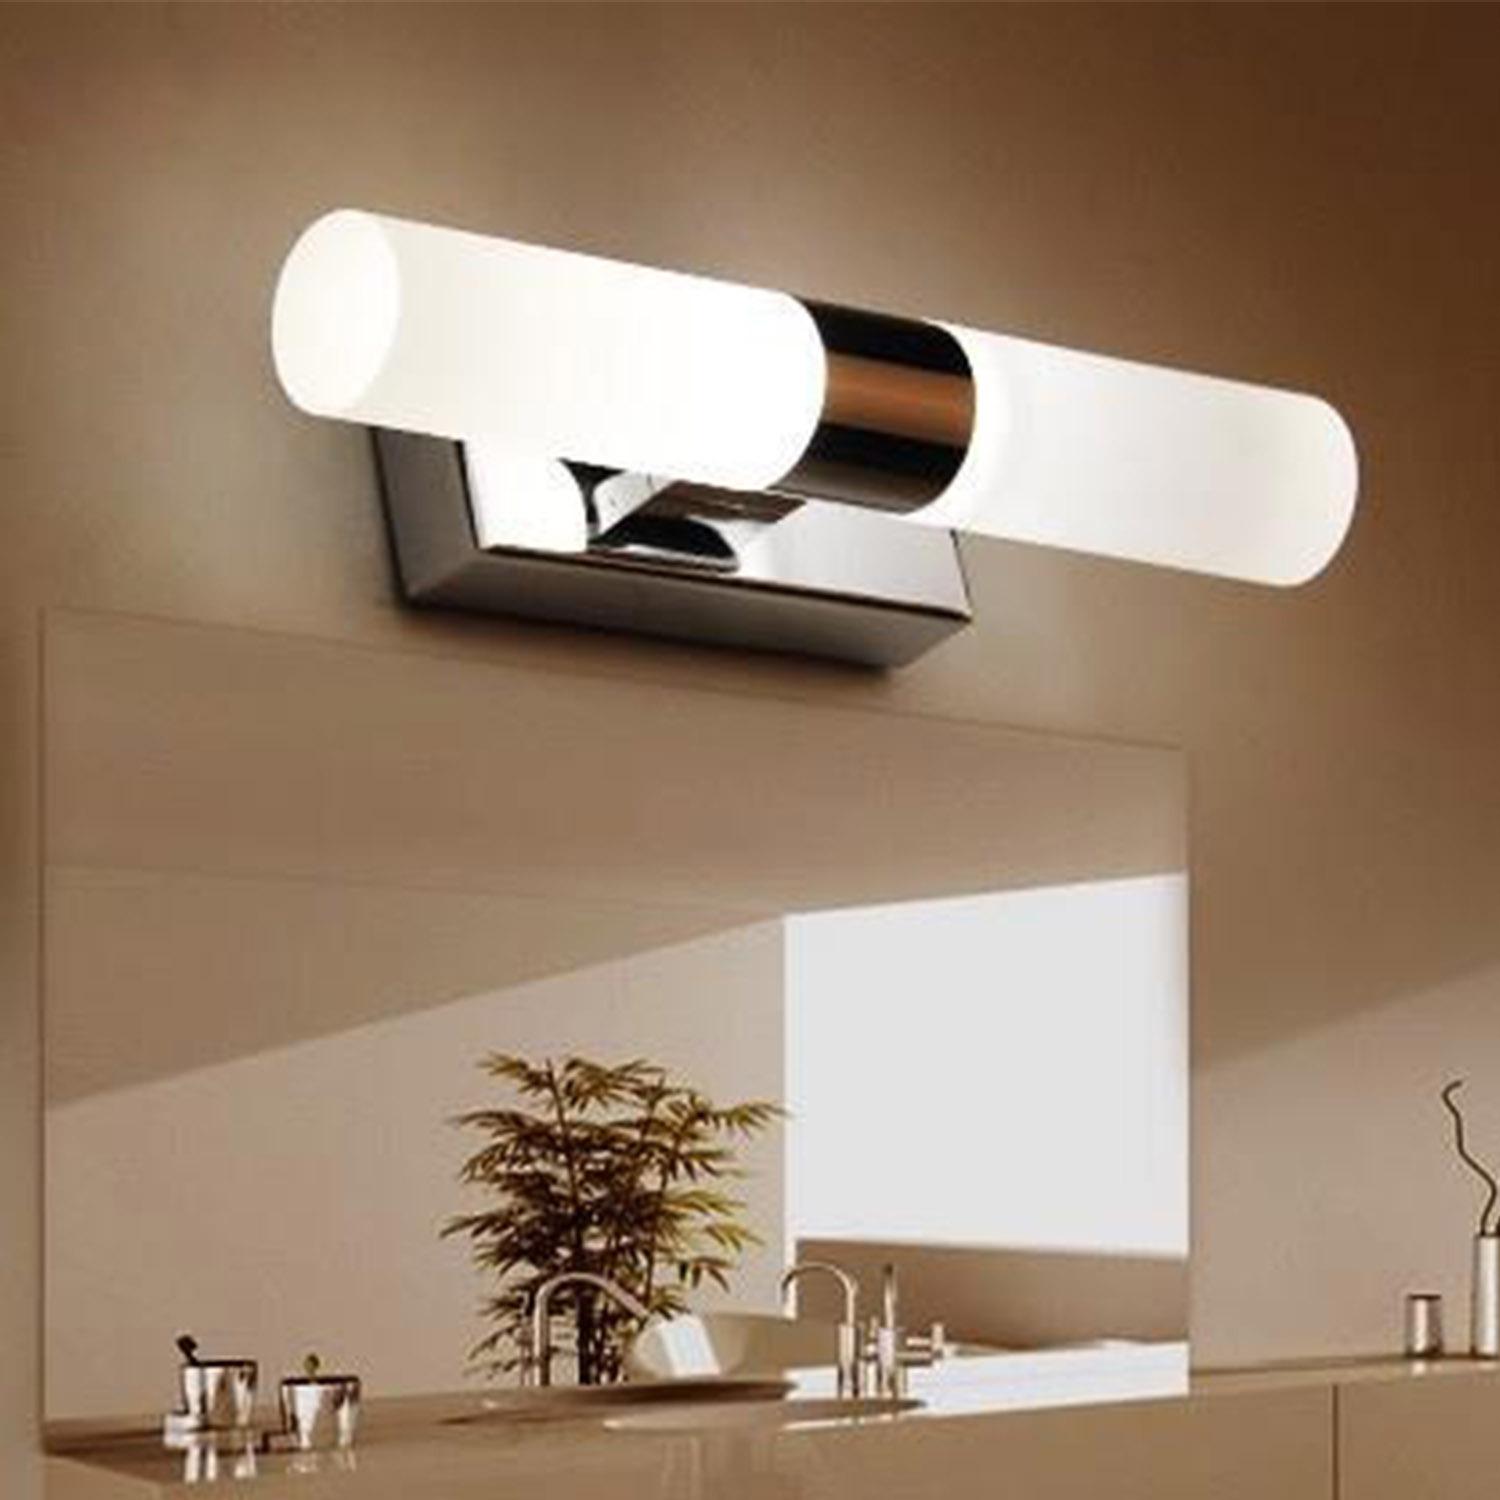 Facon 12V 16.7Inch 8W LED RV Vanity Lights Fixtures Wall ...